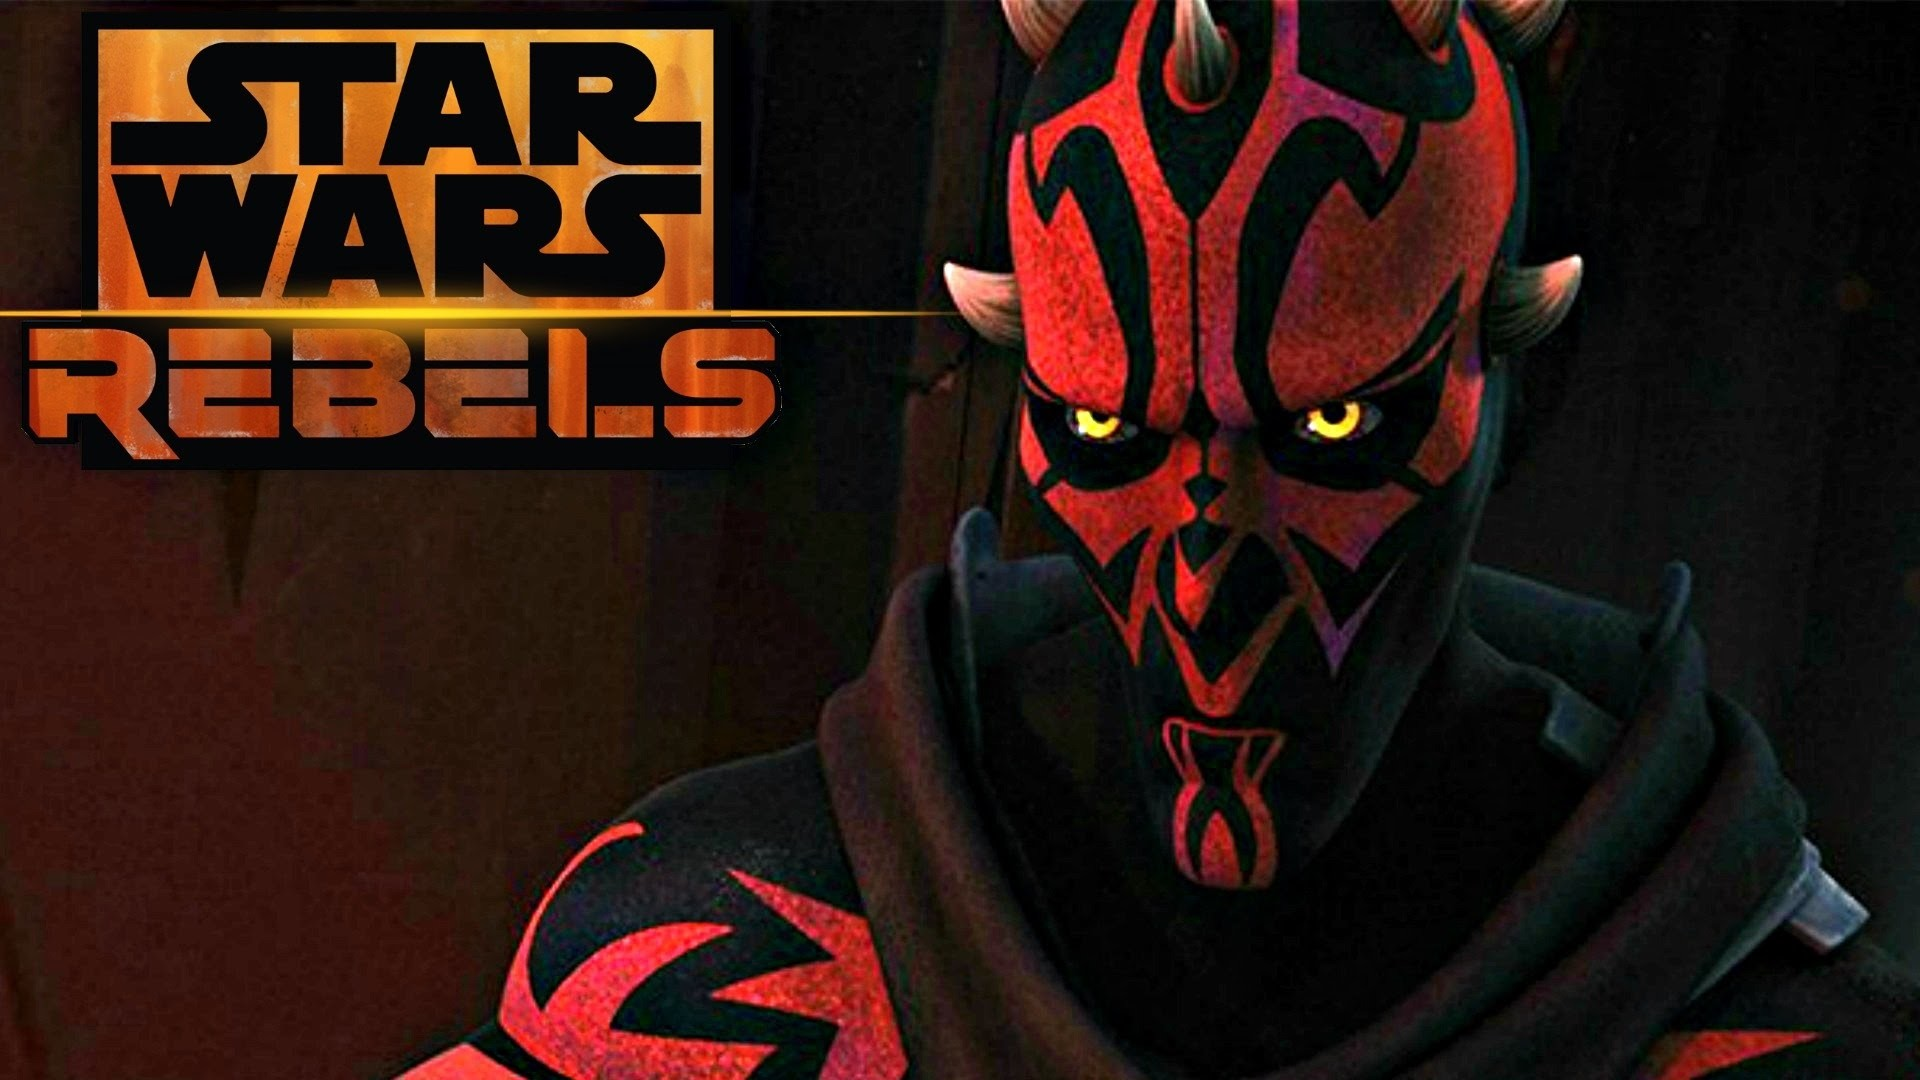 Star Wars Rebels Darth Maul Revealed